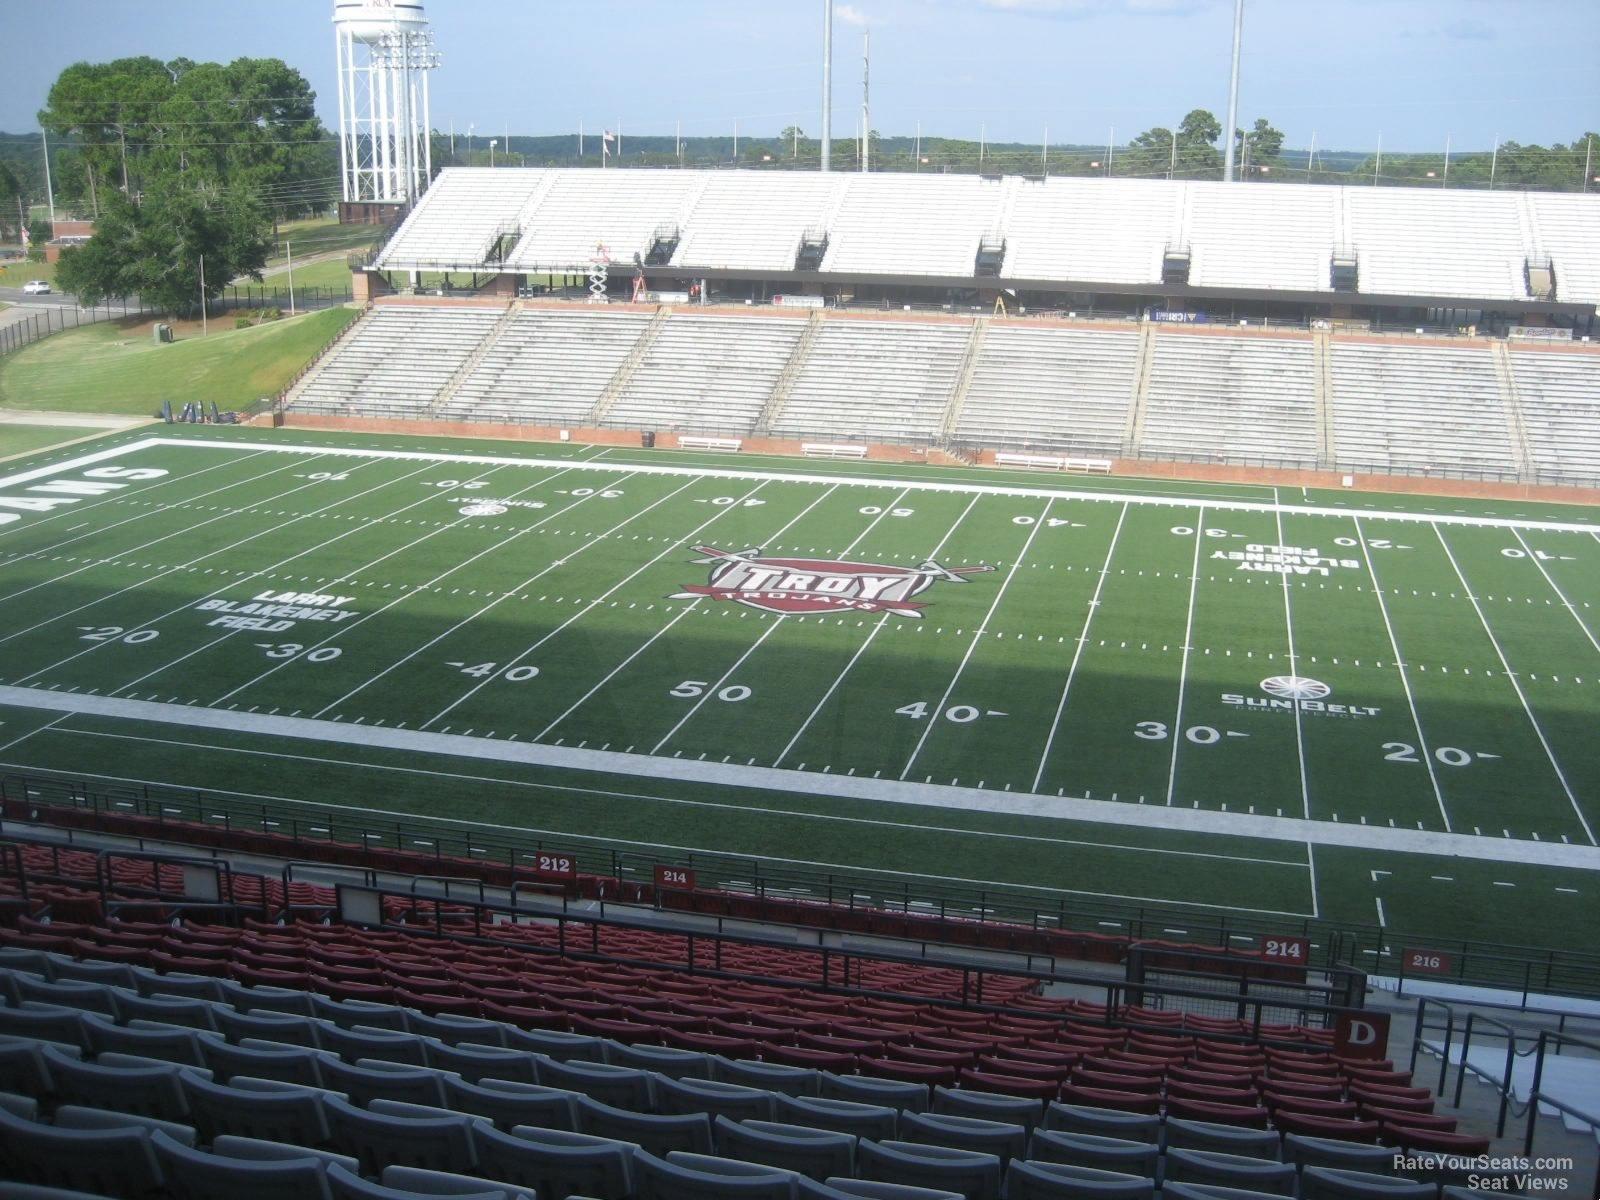 Stadium Club D seat view